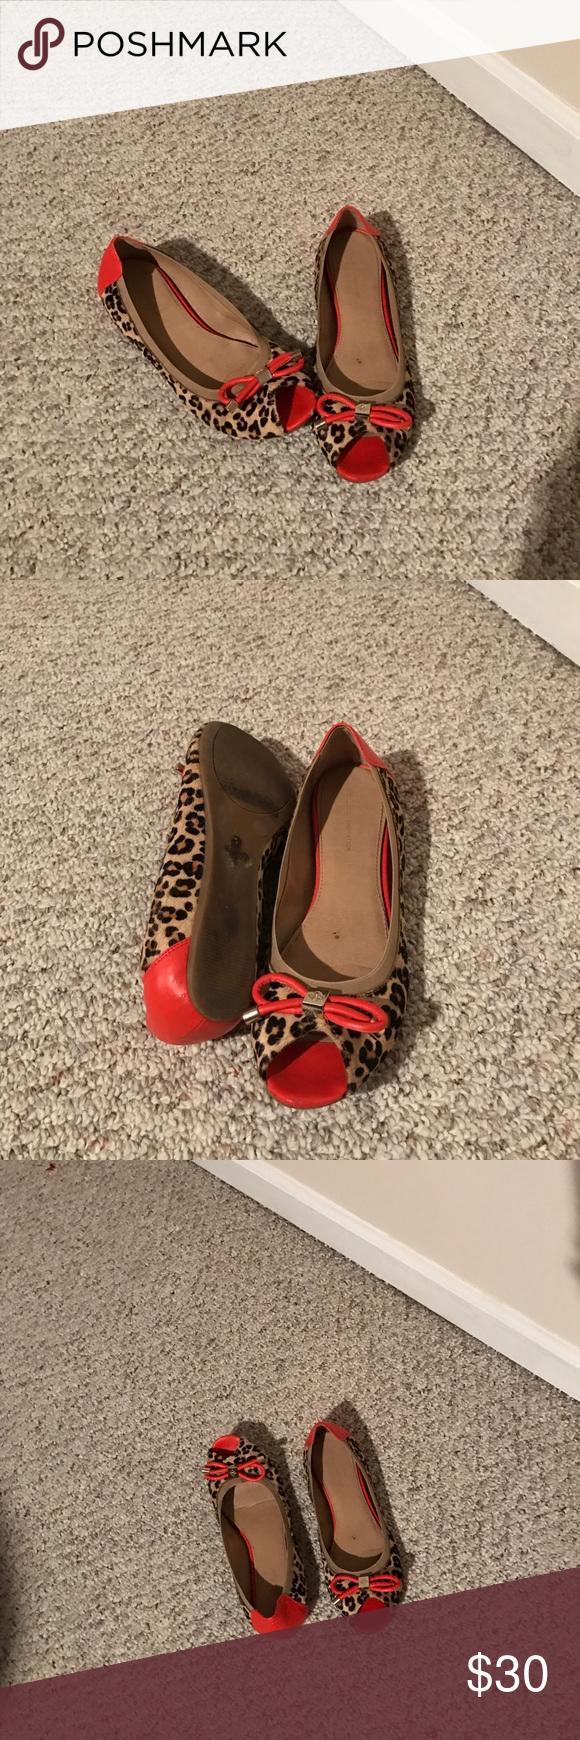 BCBG BCBGeneration Ballet Flats Leopard Print Excellent used condition. BCBG Shoes Flats & Loafers